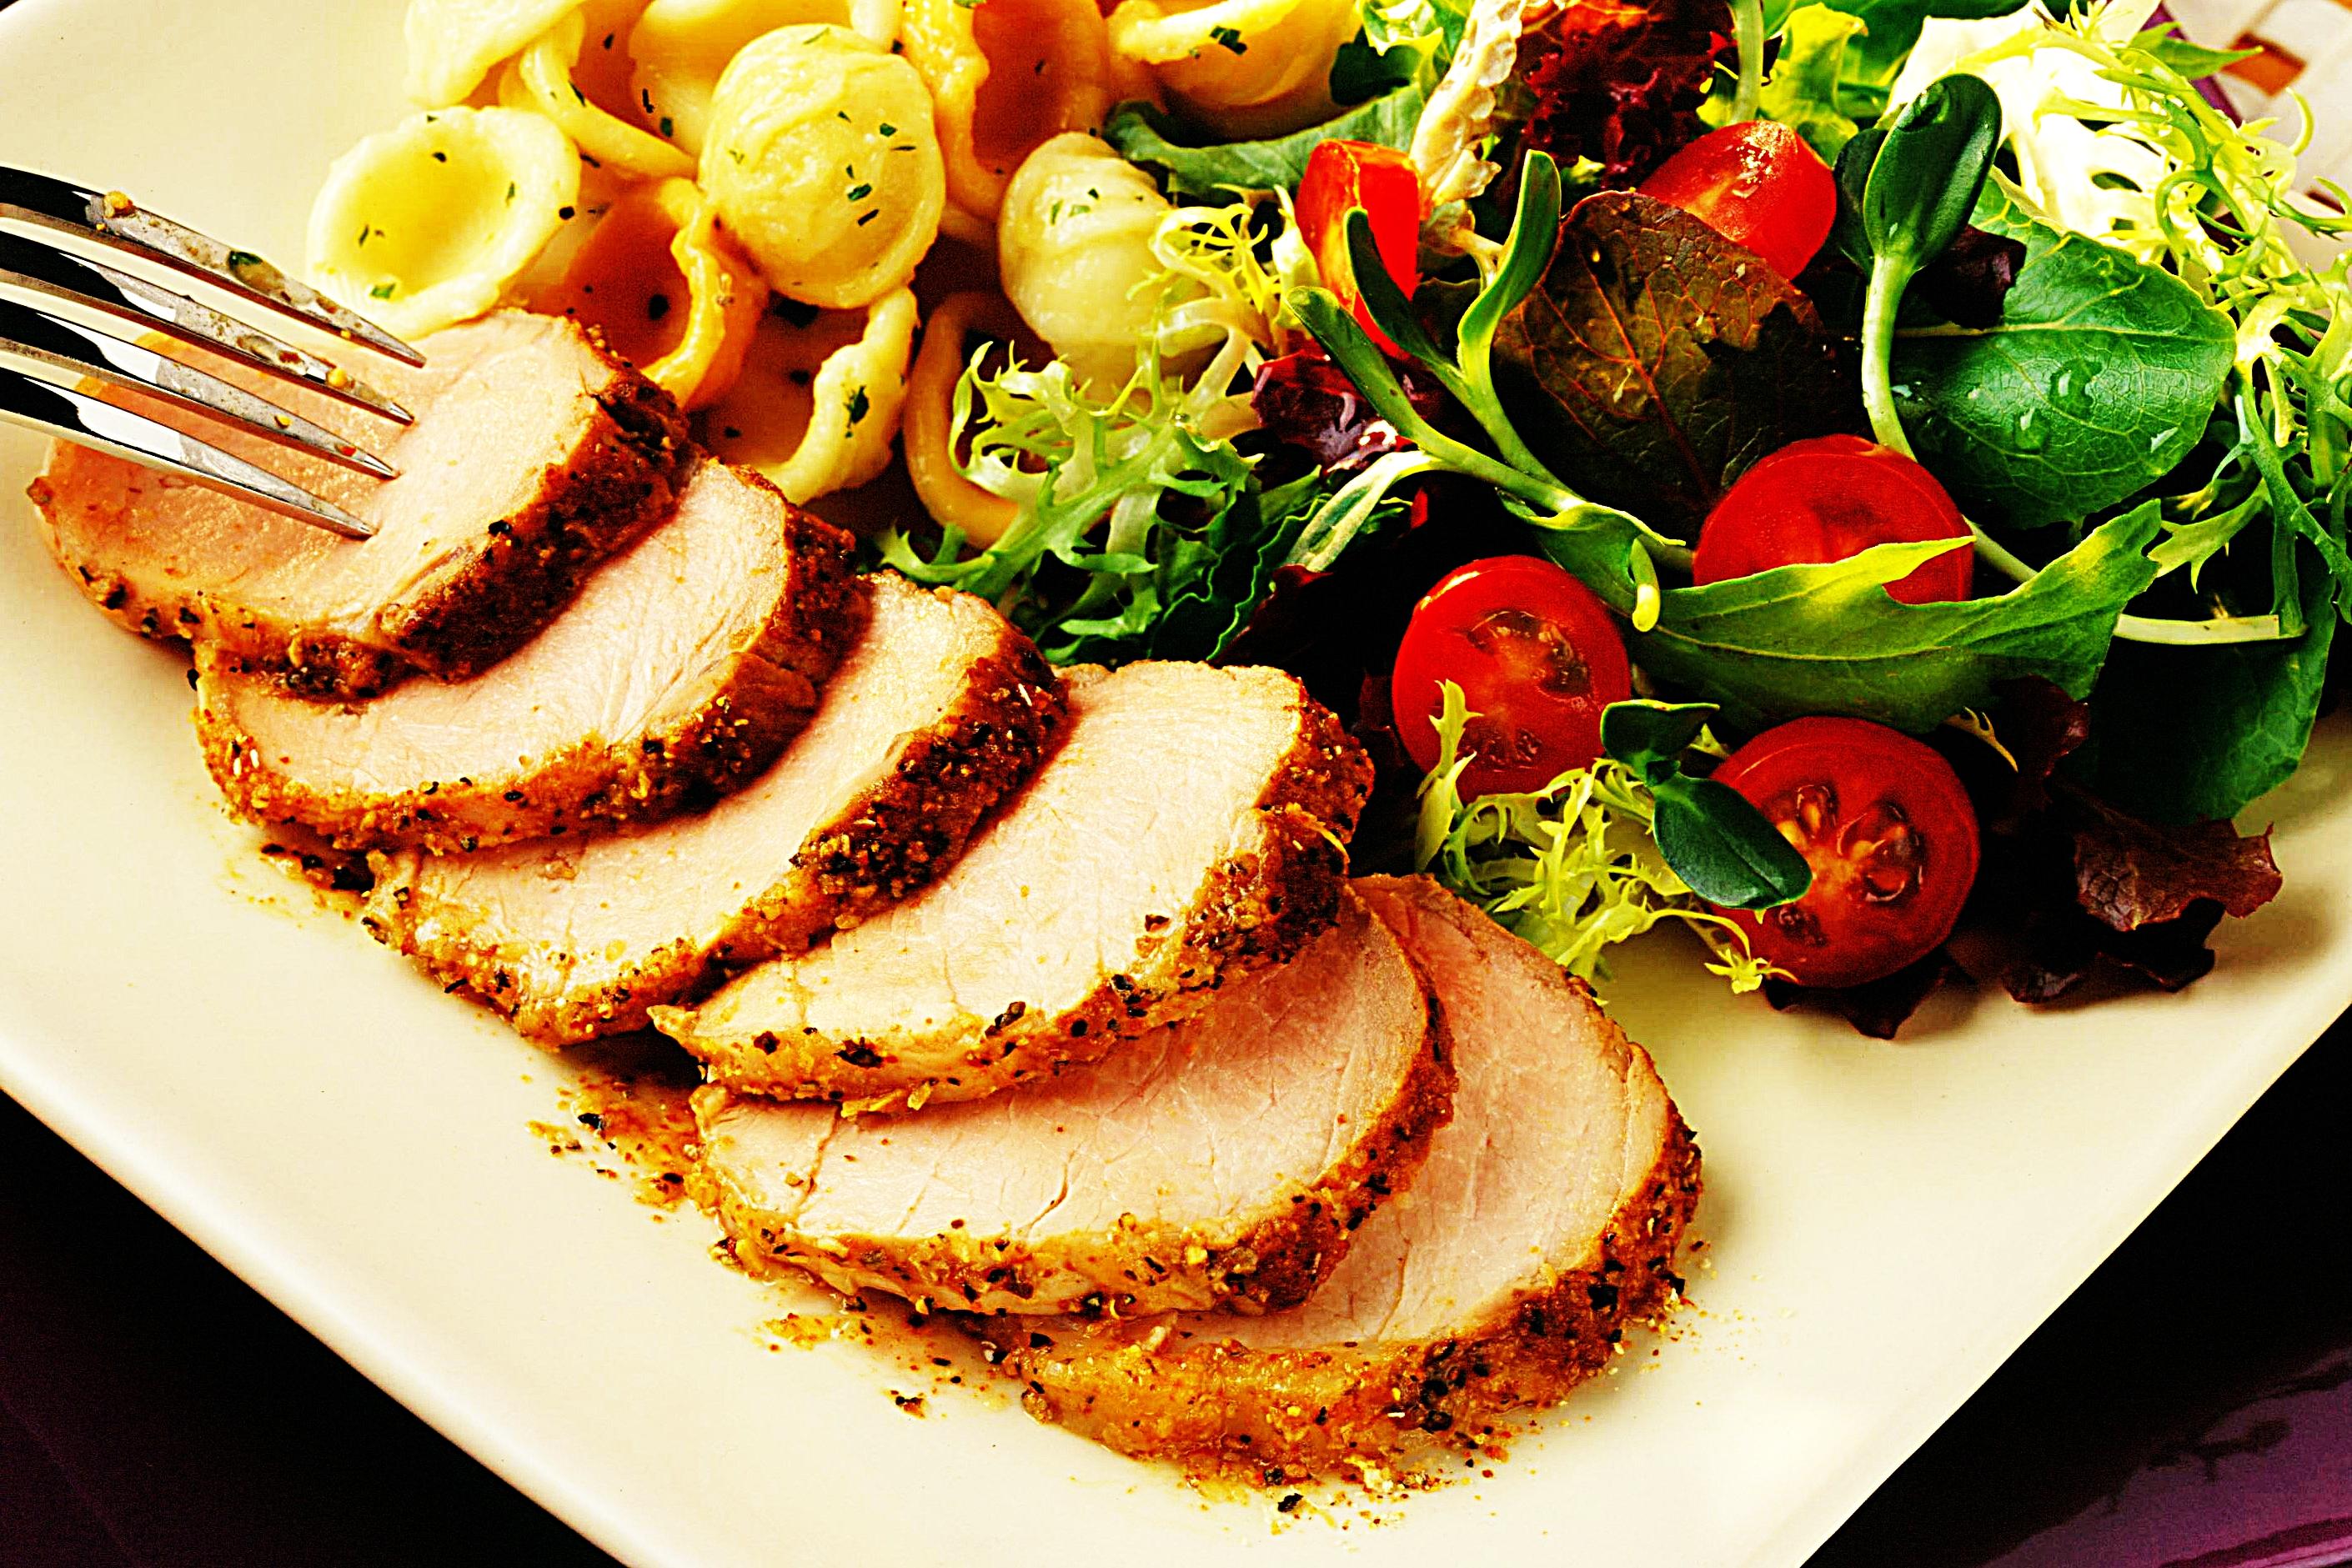 Stupid-Easy Recipe for Peppered Pork Tenderloin (#1 Top-Rated)